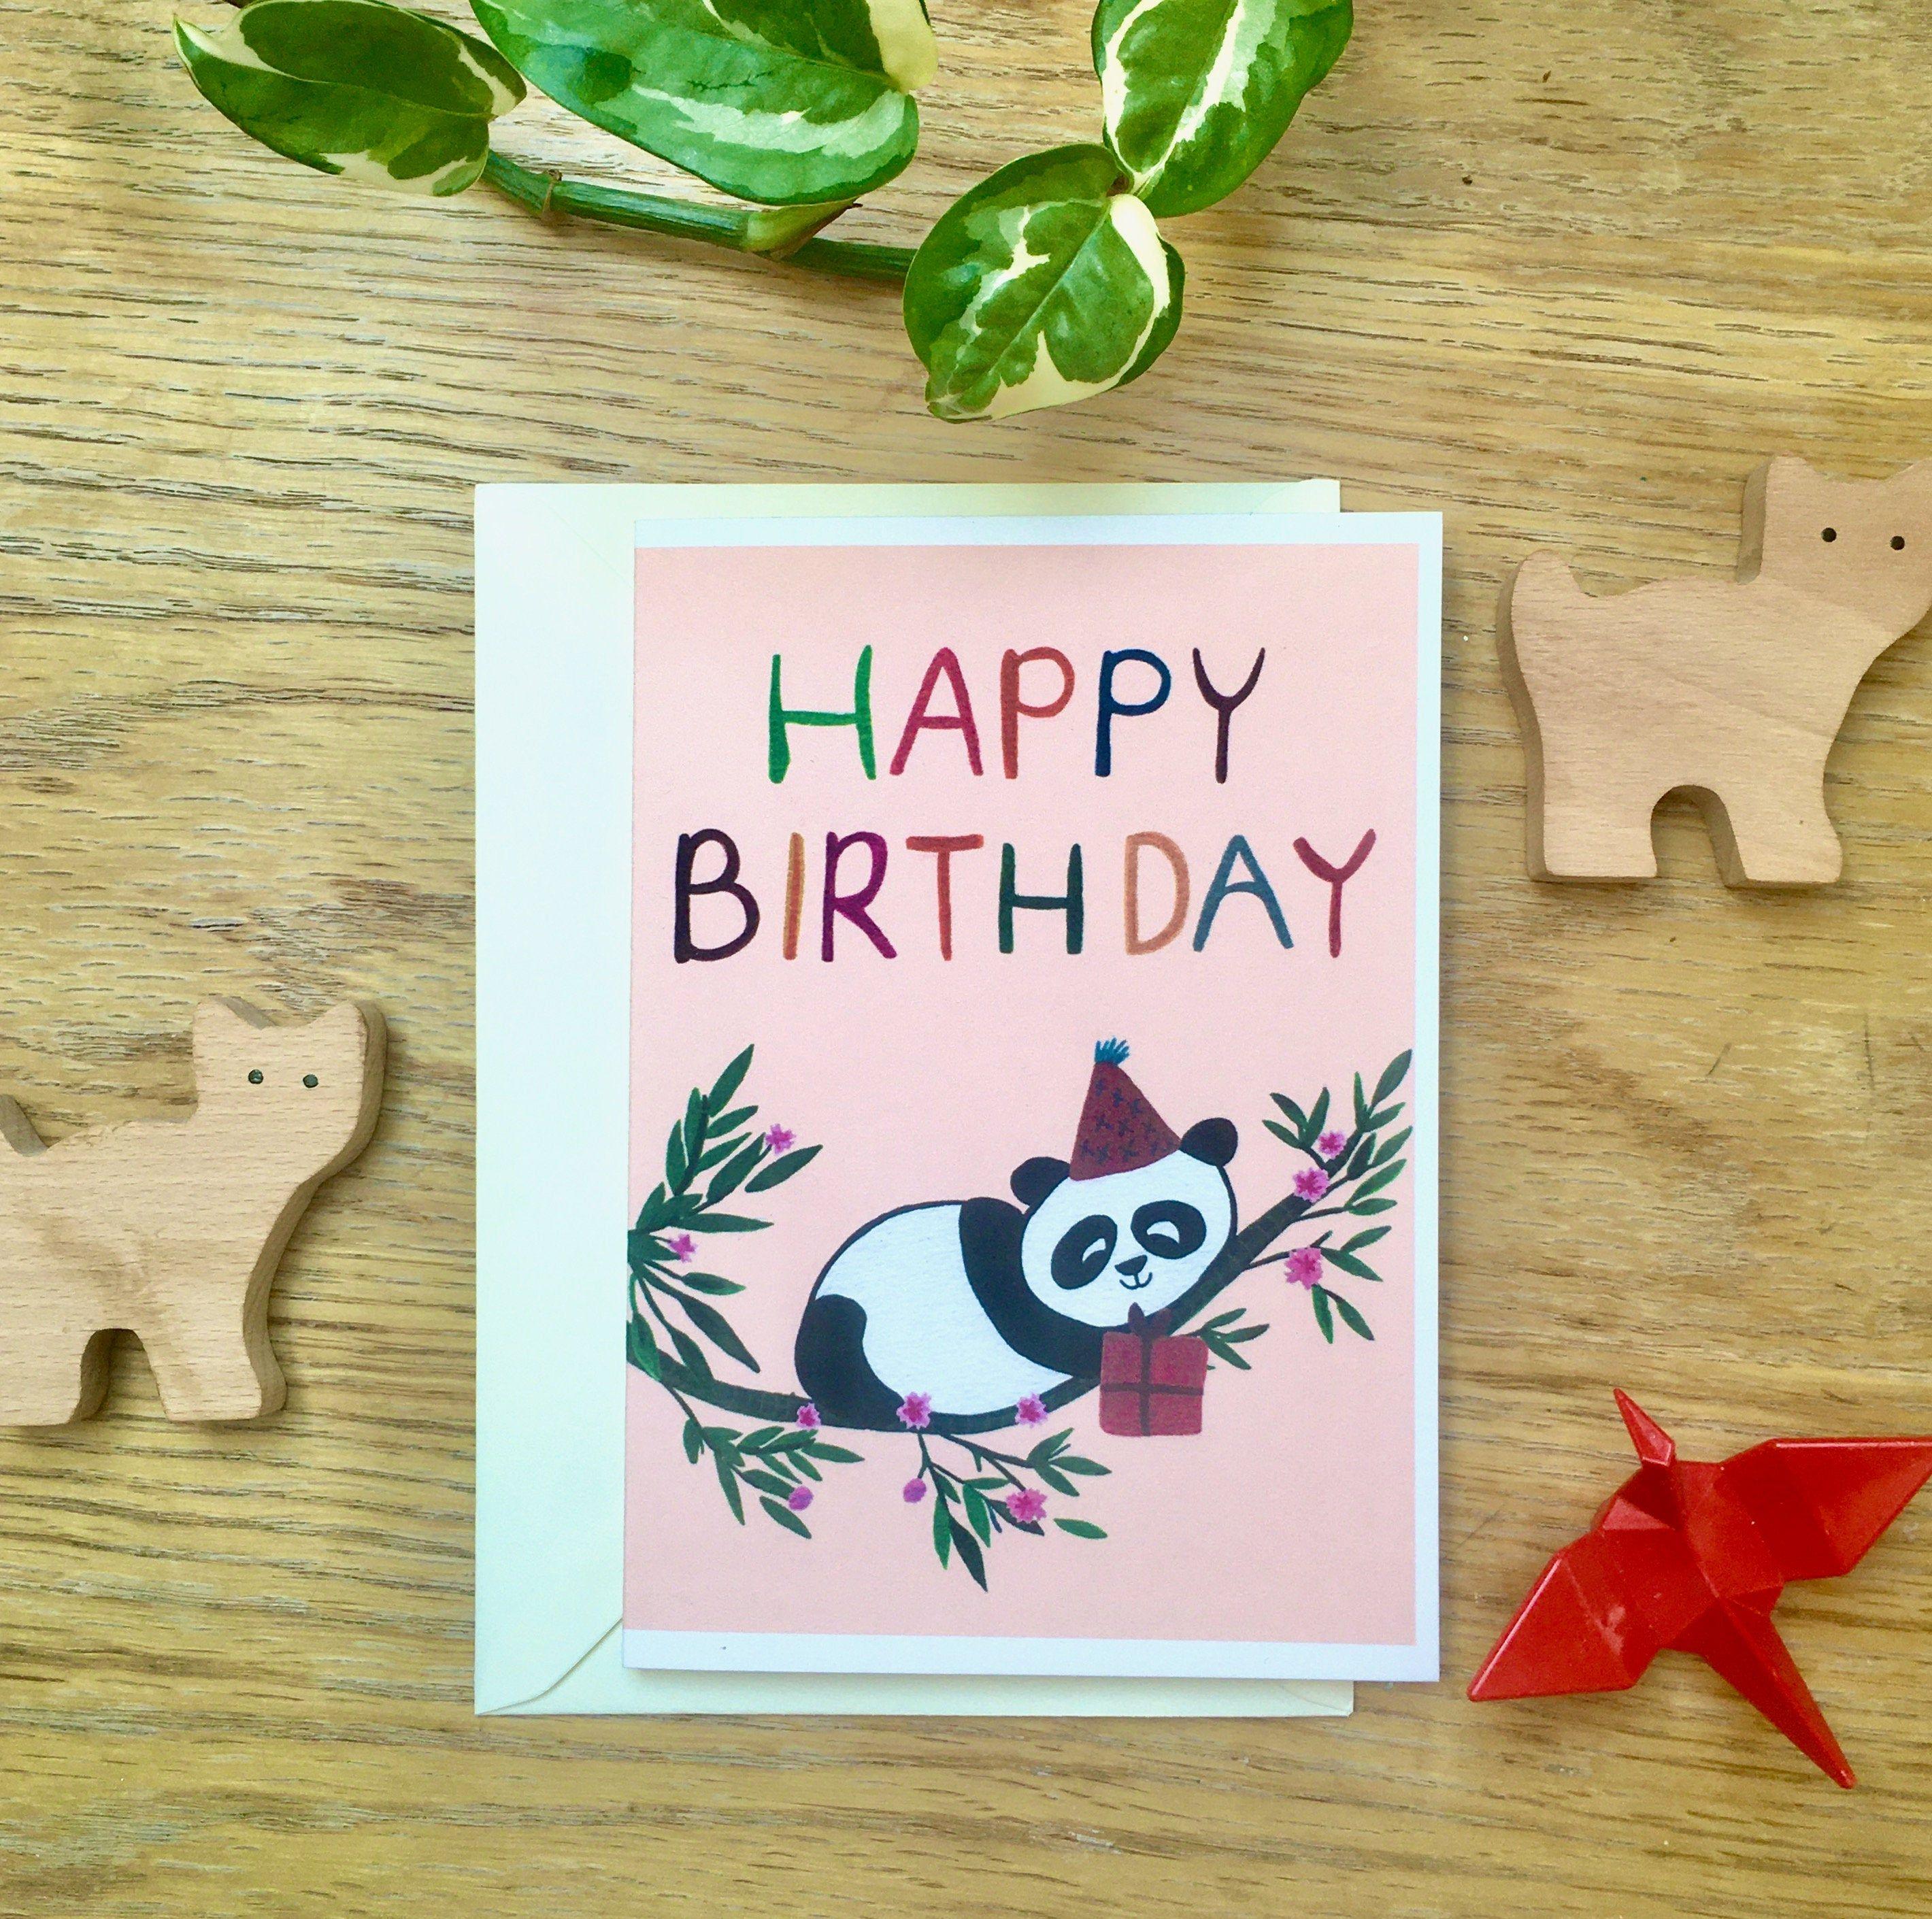 Happy Birthday Card Panda Illustration Cute Birthday Card Etsy Cute Birthday Cards Kids Birthday Cards Happy Birthday Cards